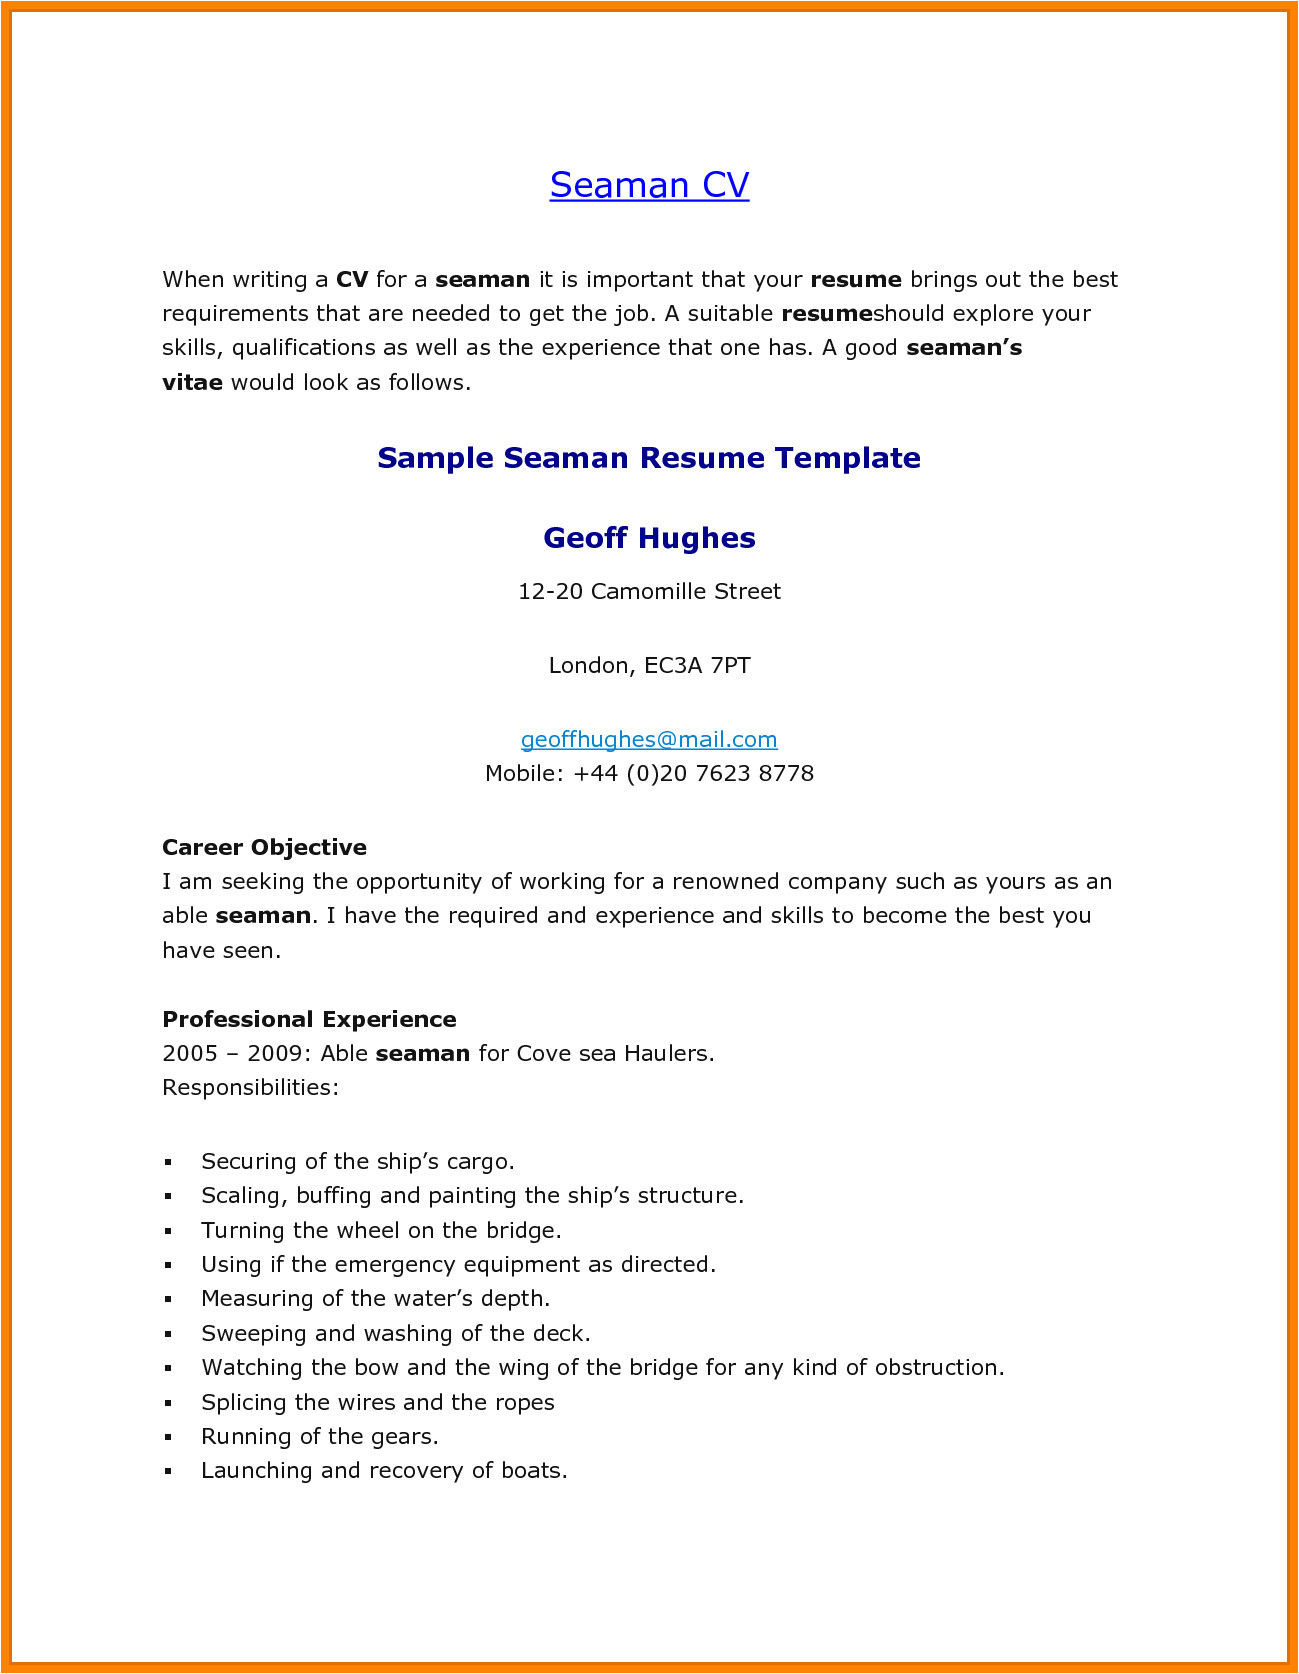 resume sample format for seaman